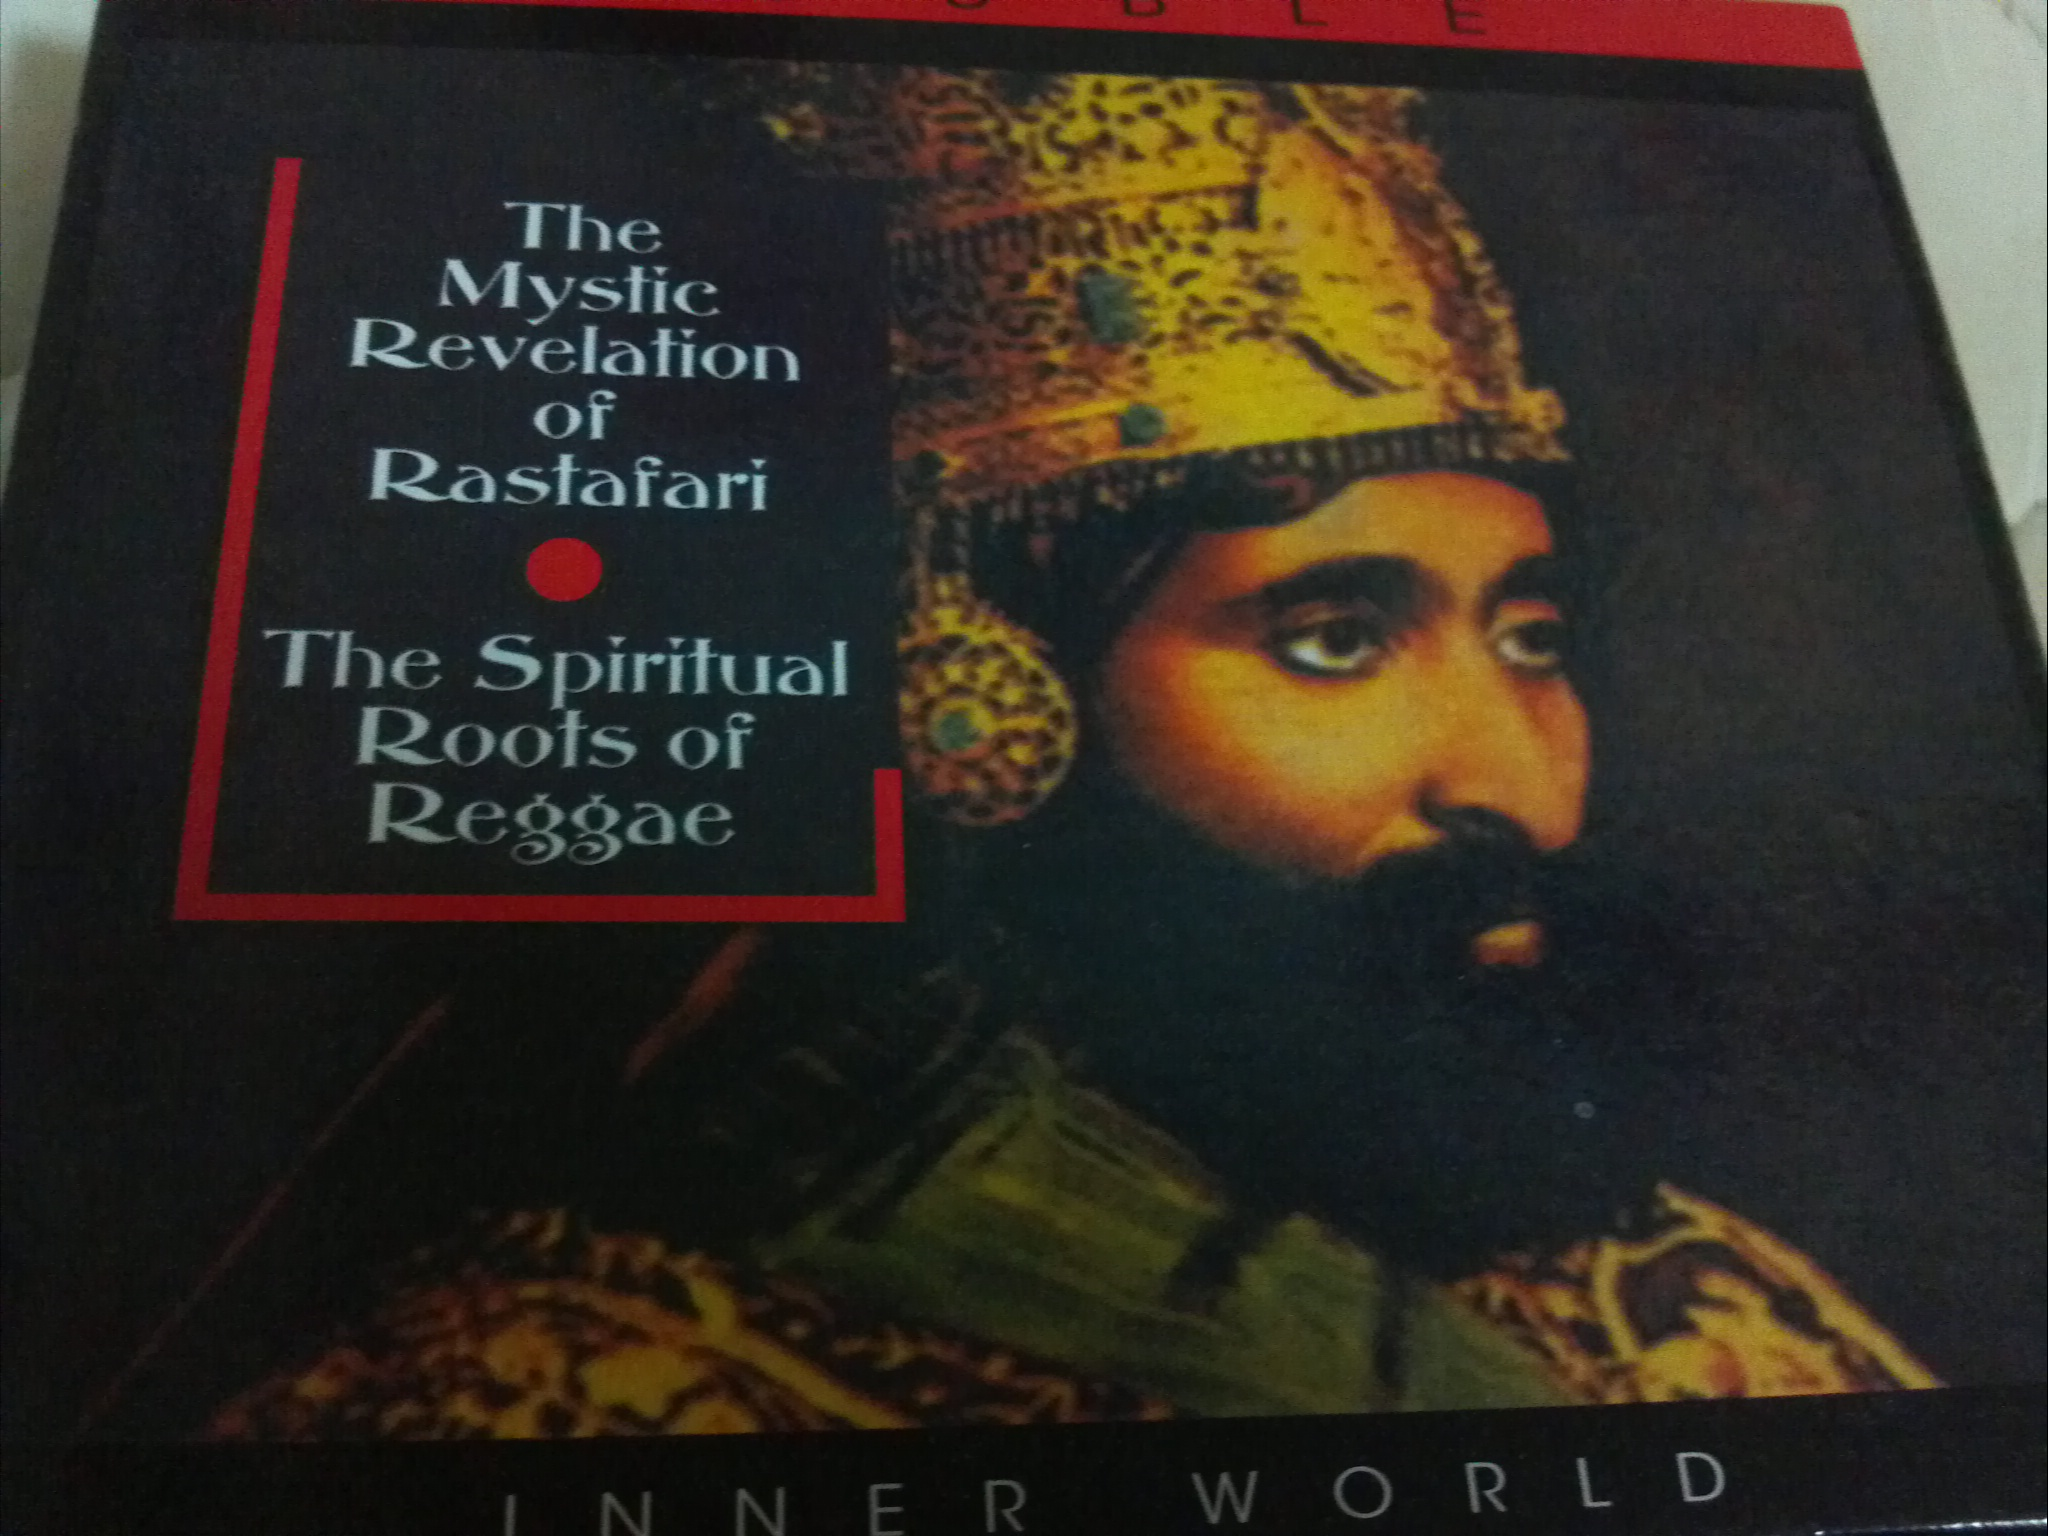 The  MysticRevelation of Rastafari